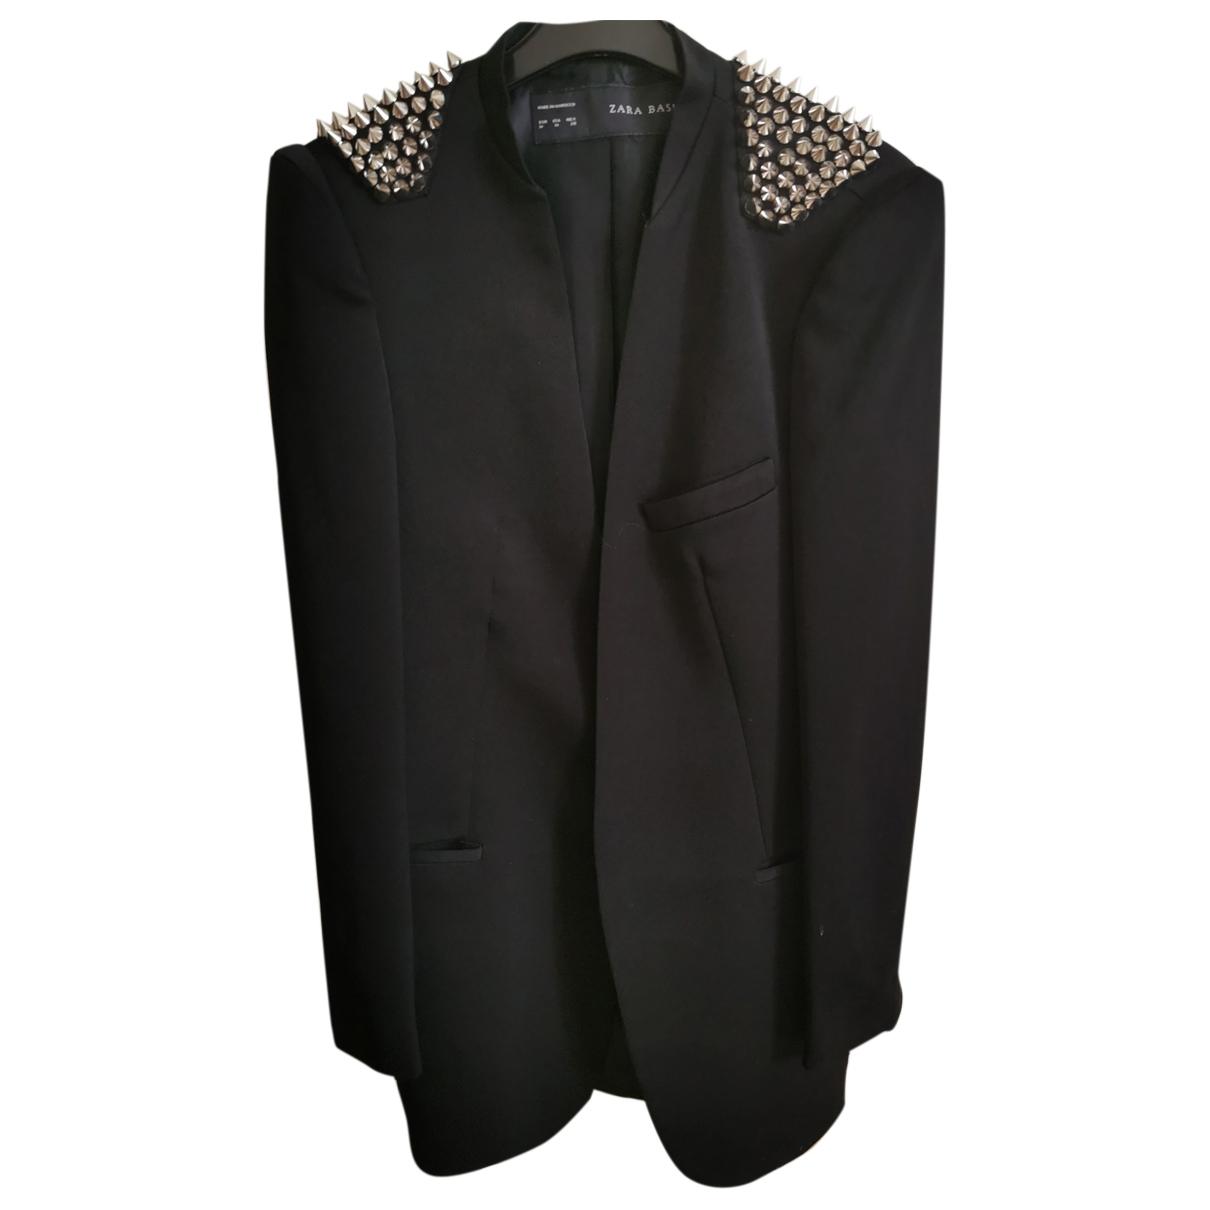 Zara \N Black jacket for Women M International